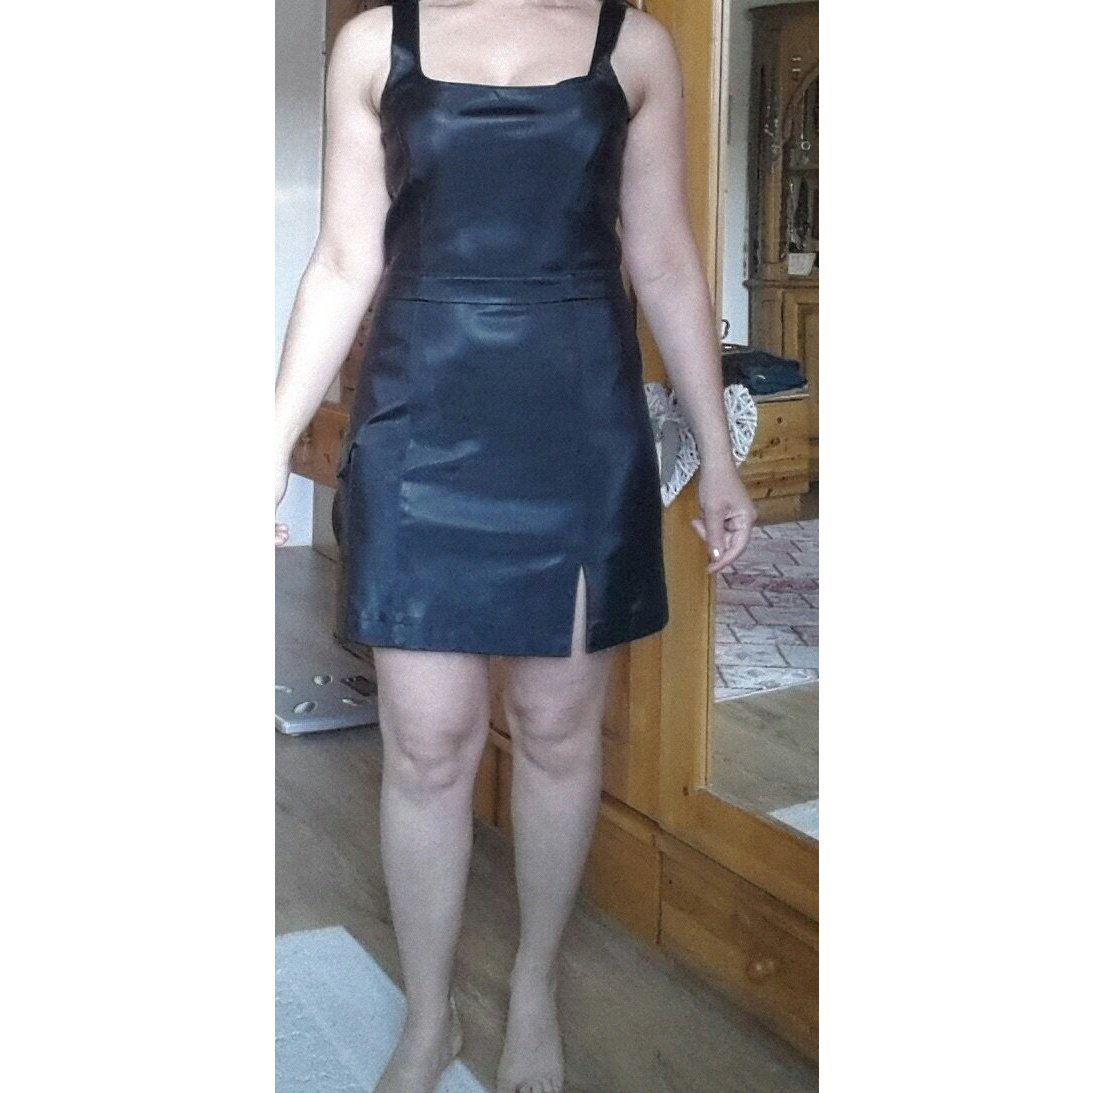 Lederimitat Kleid mit Lycra Gr.38